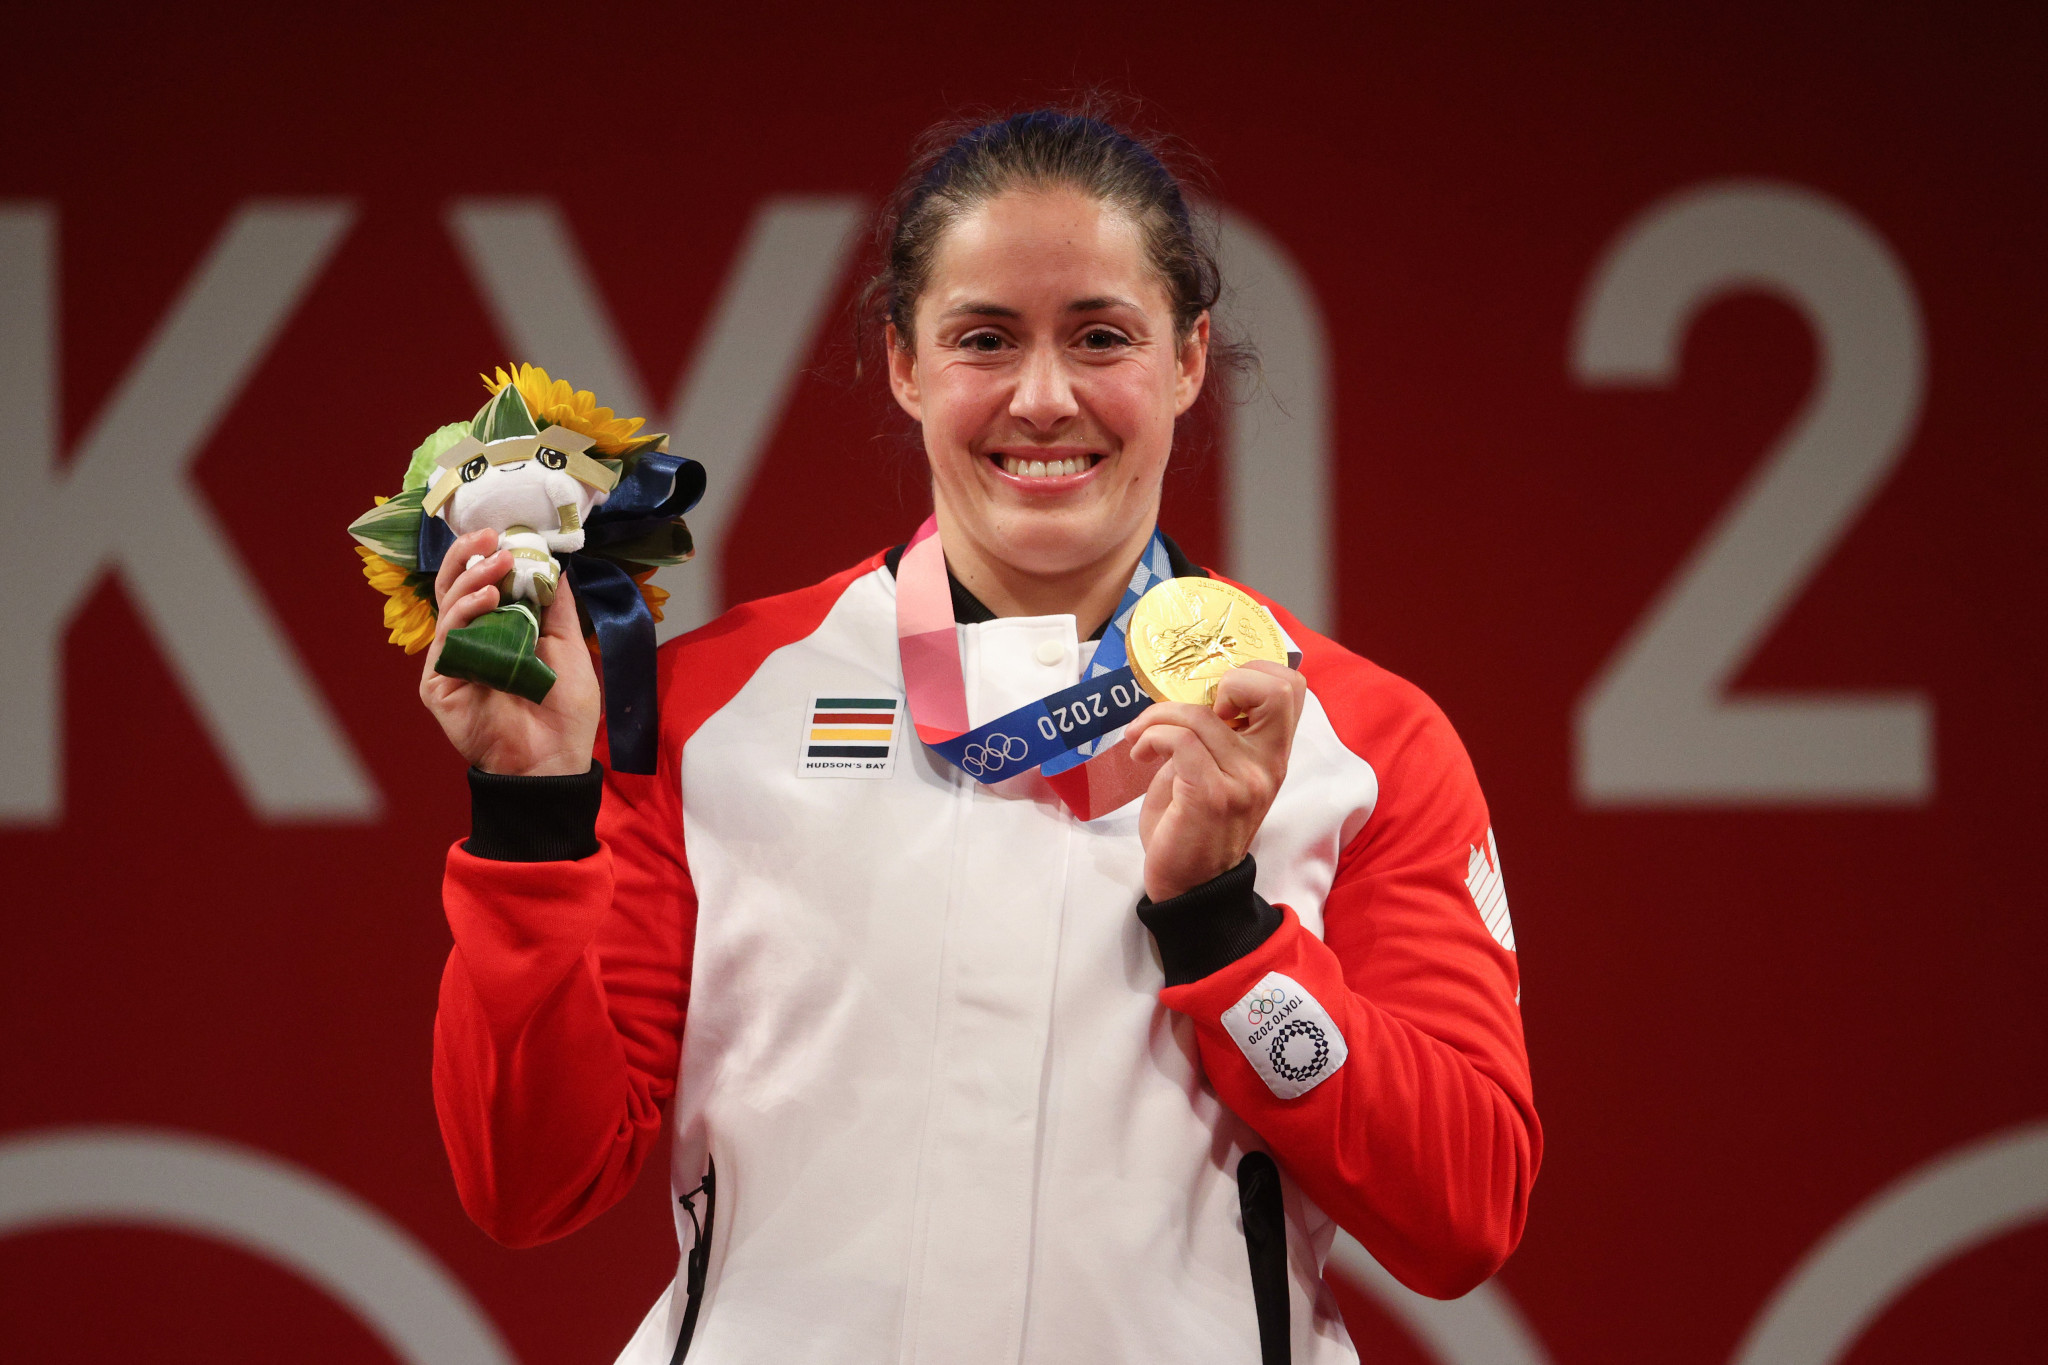 U SPORTS celebrate four Canadian FISU champions becoming Tokyo 2020 medallists